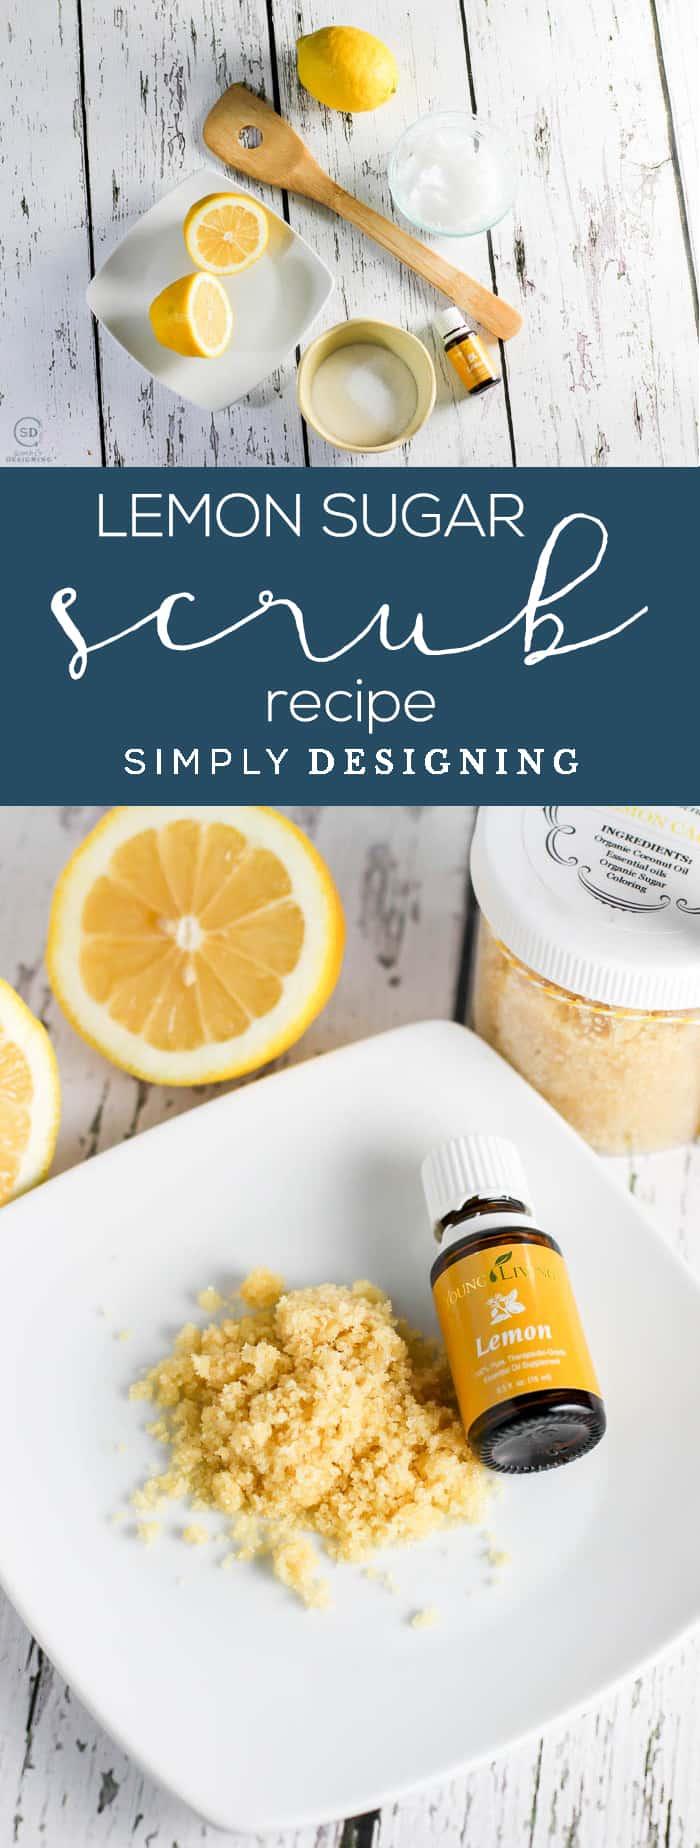 Lemon Sugar Scrub Recipe - 4 ingredient DIY Sugar Scrub